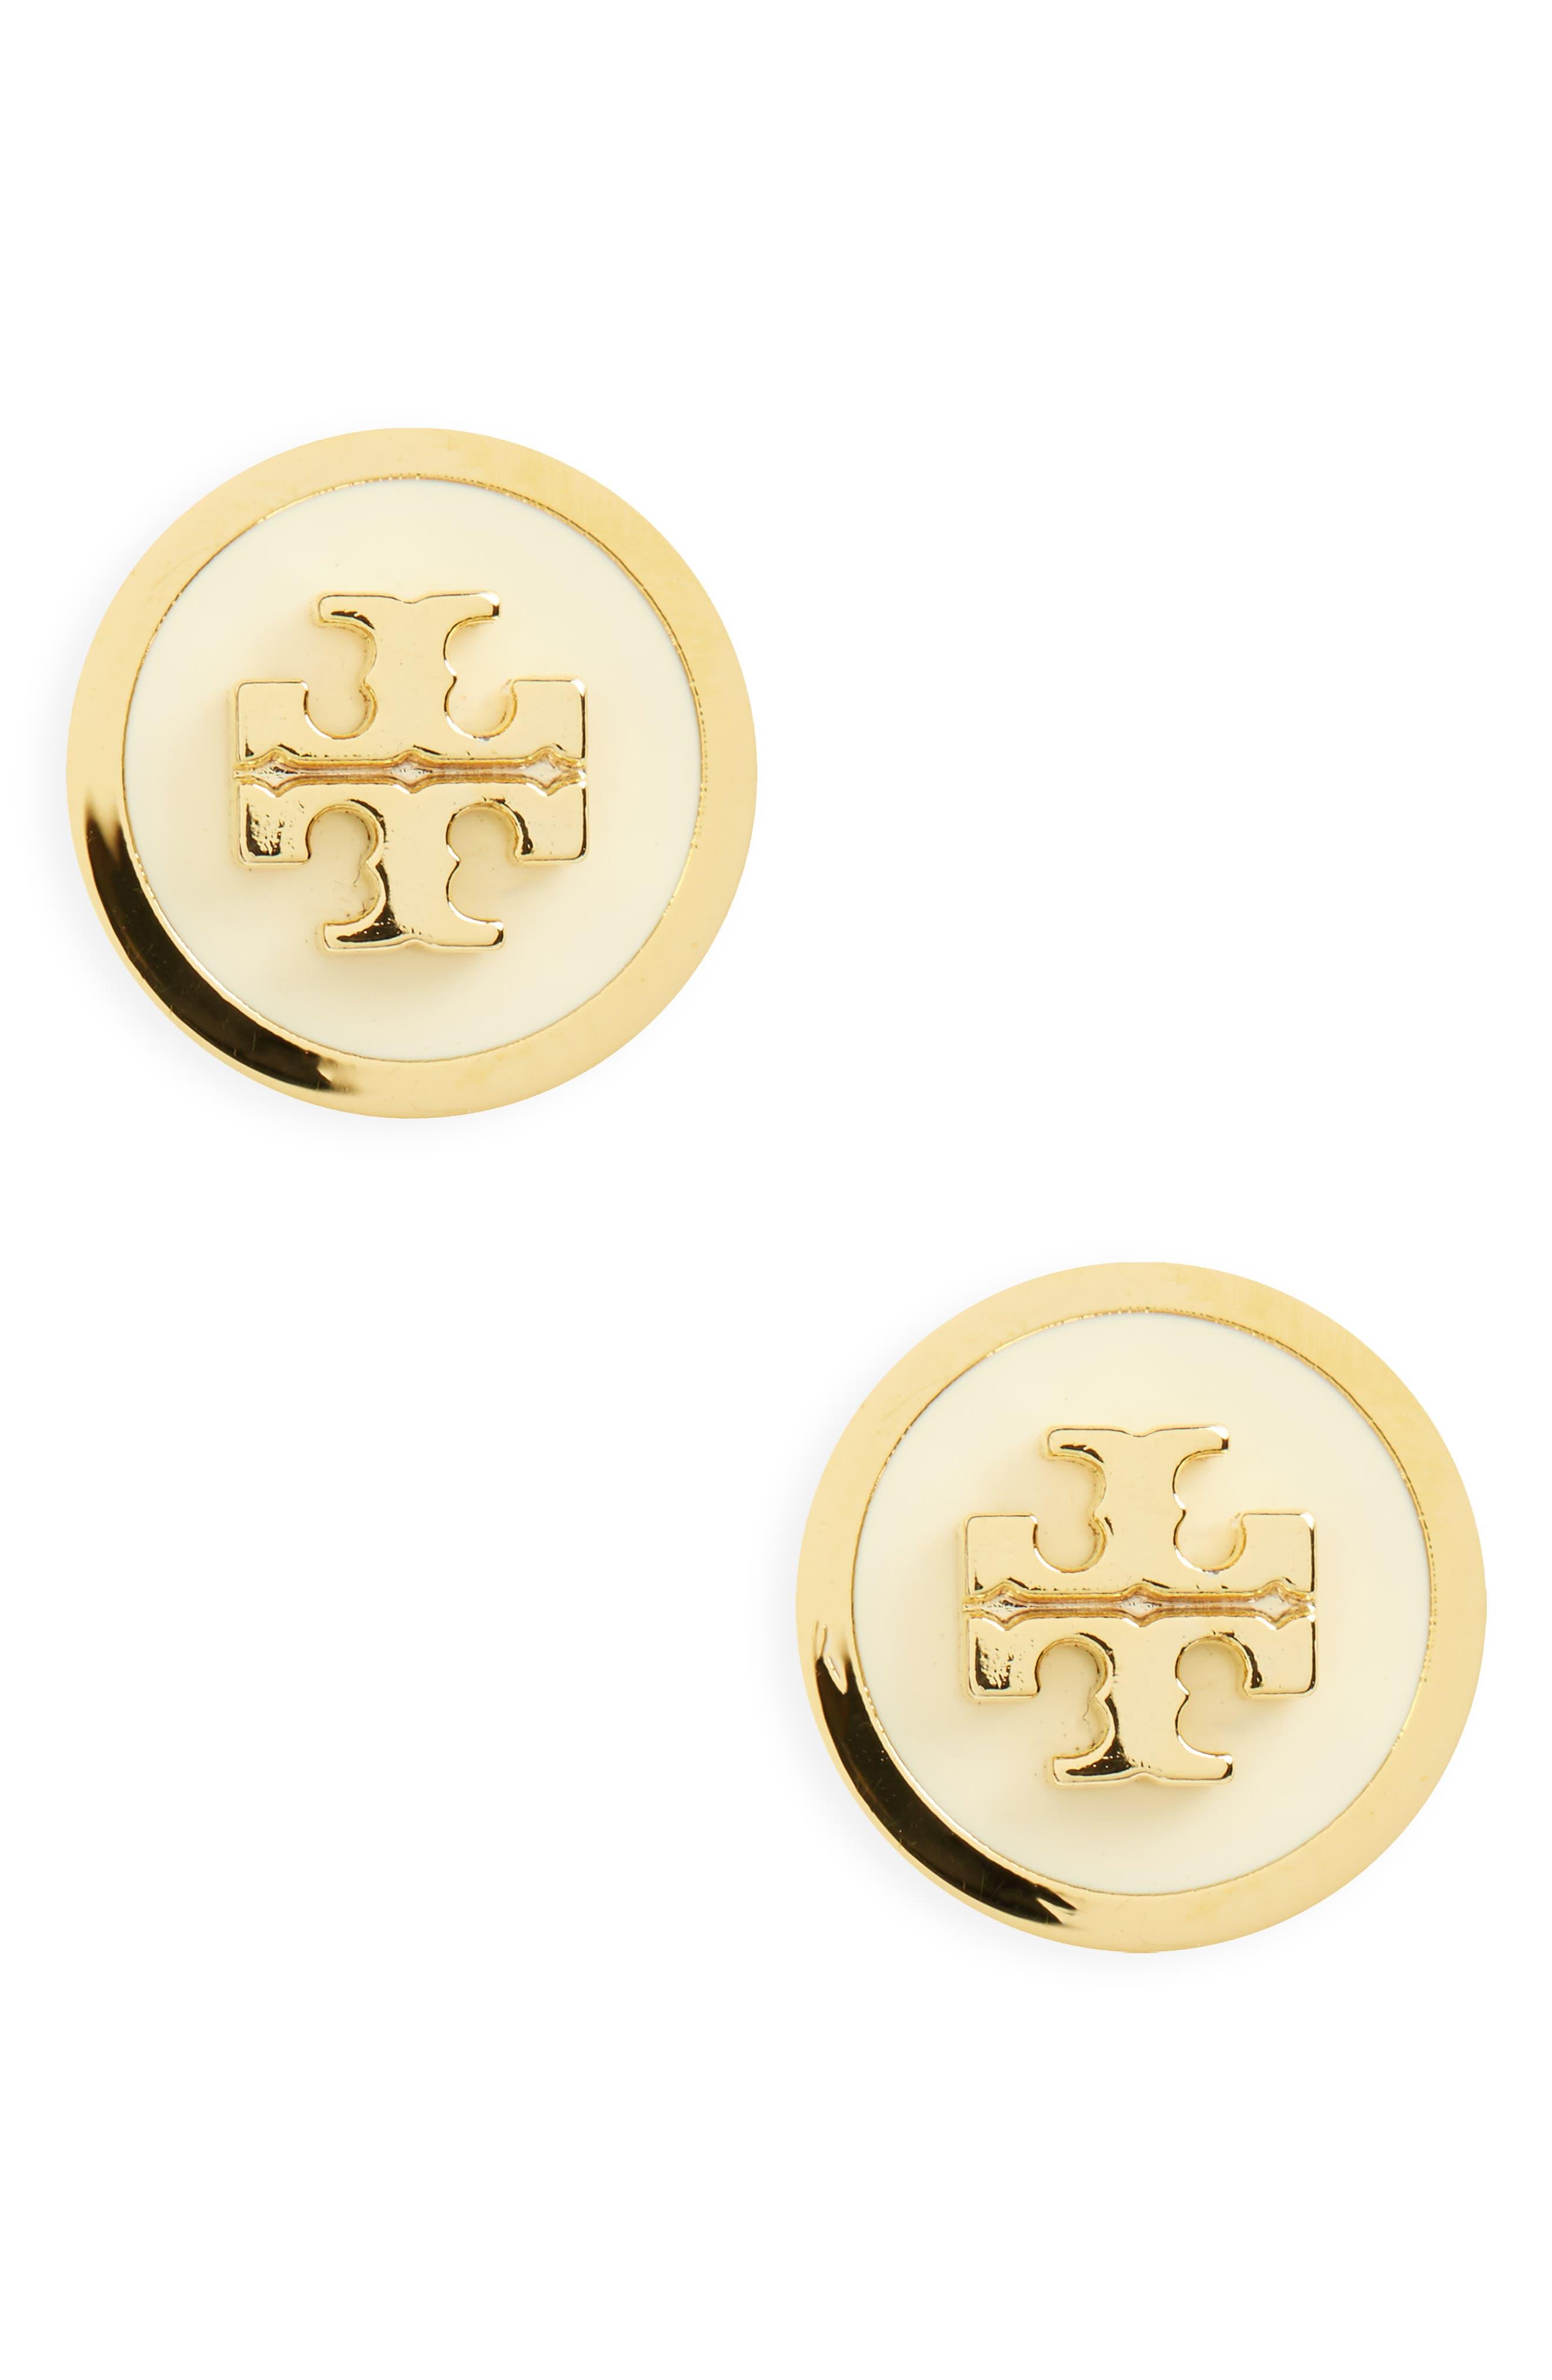 Logo Stud Earrings,                             Main thumbnail 1, color,                             New Ivory / Tory Gold